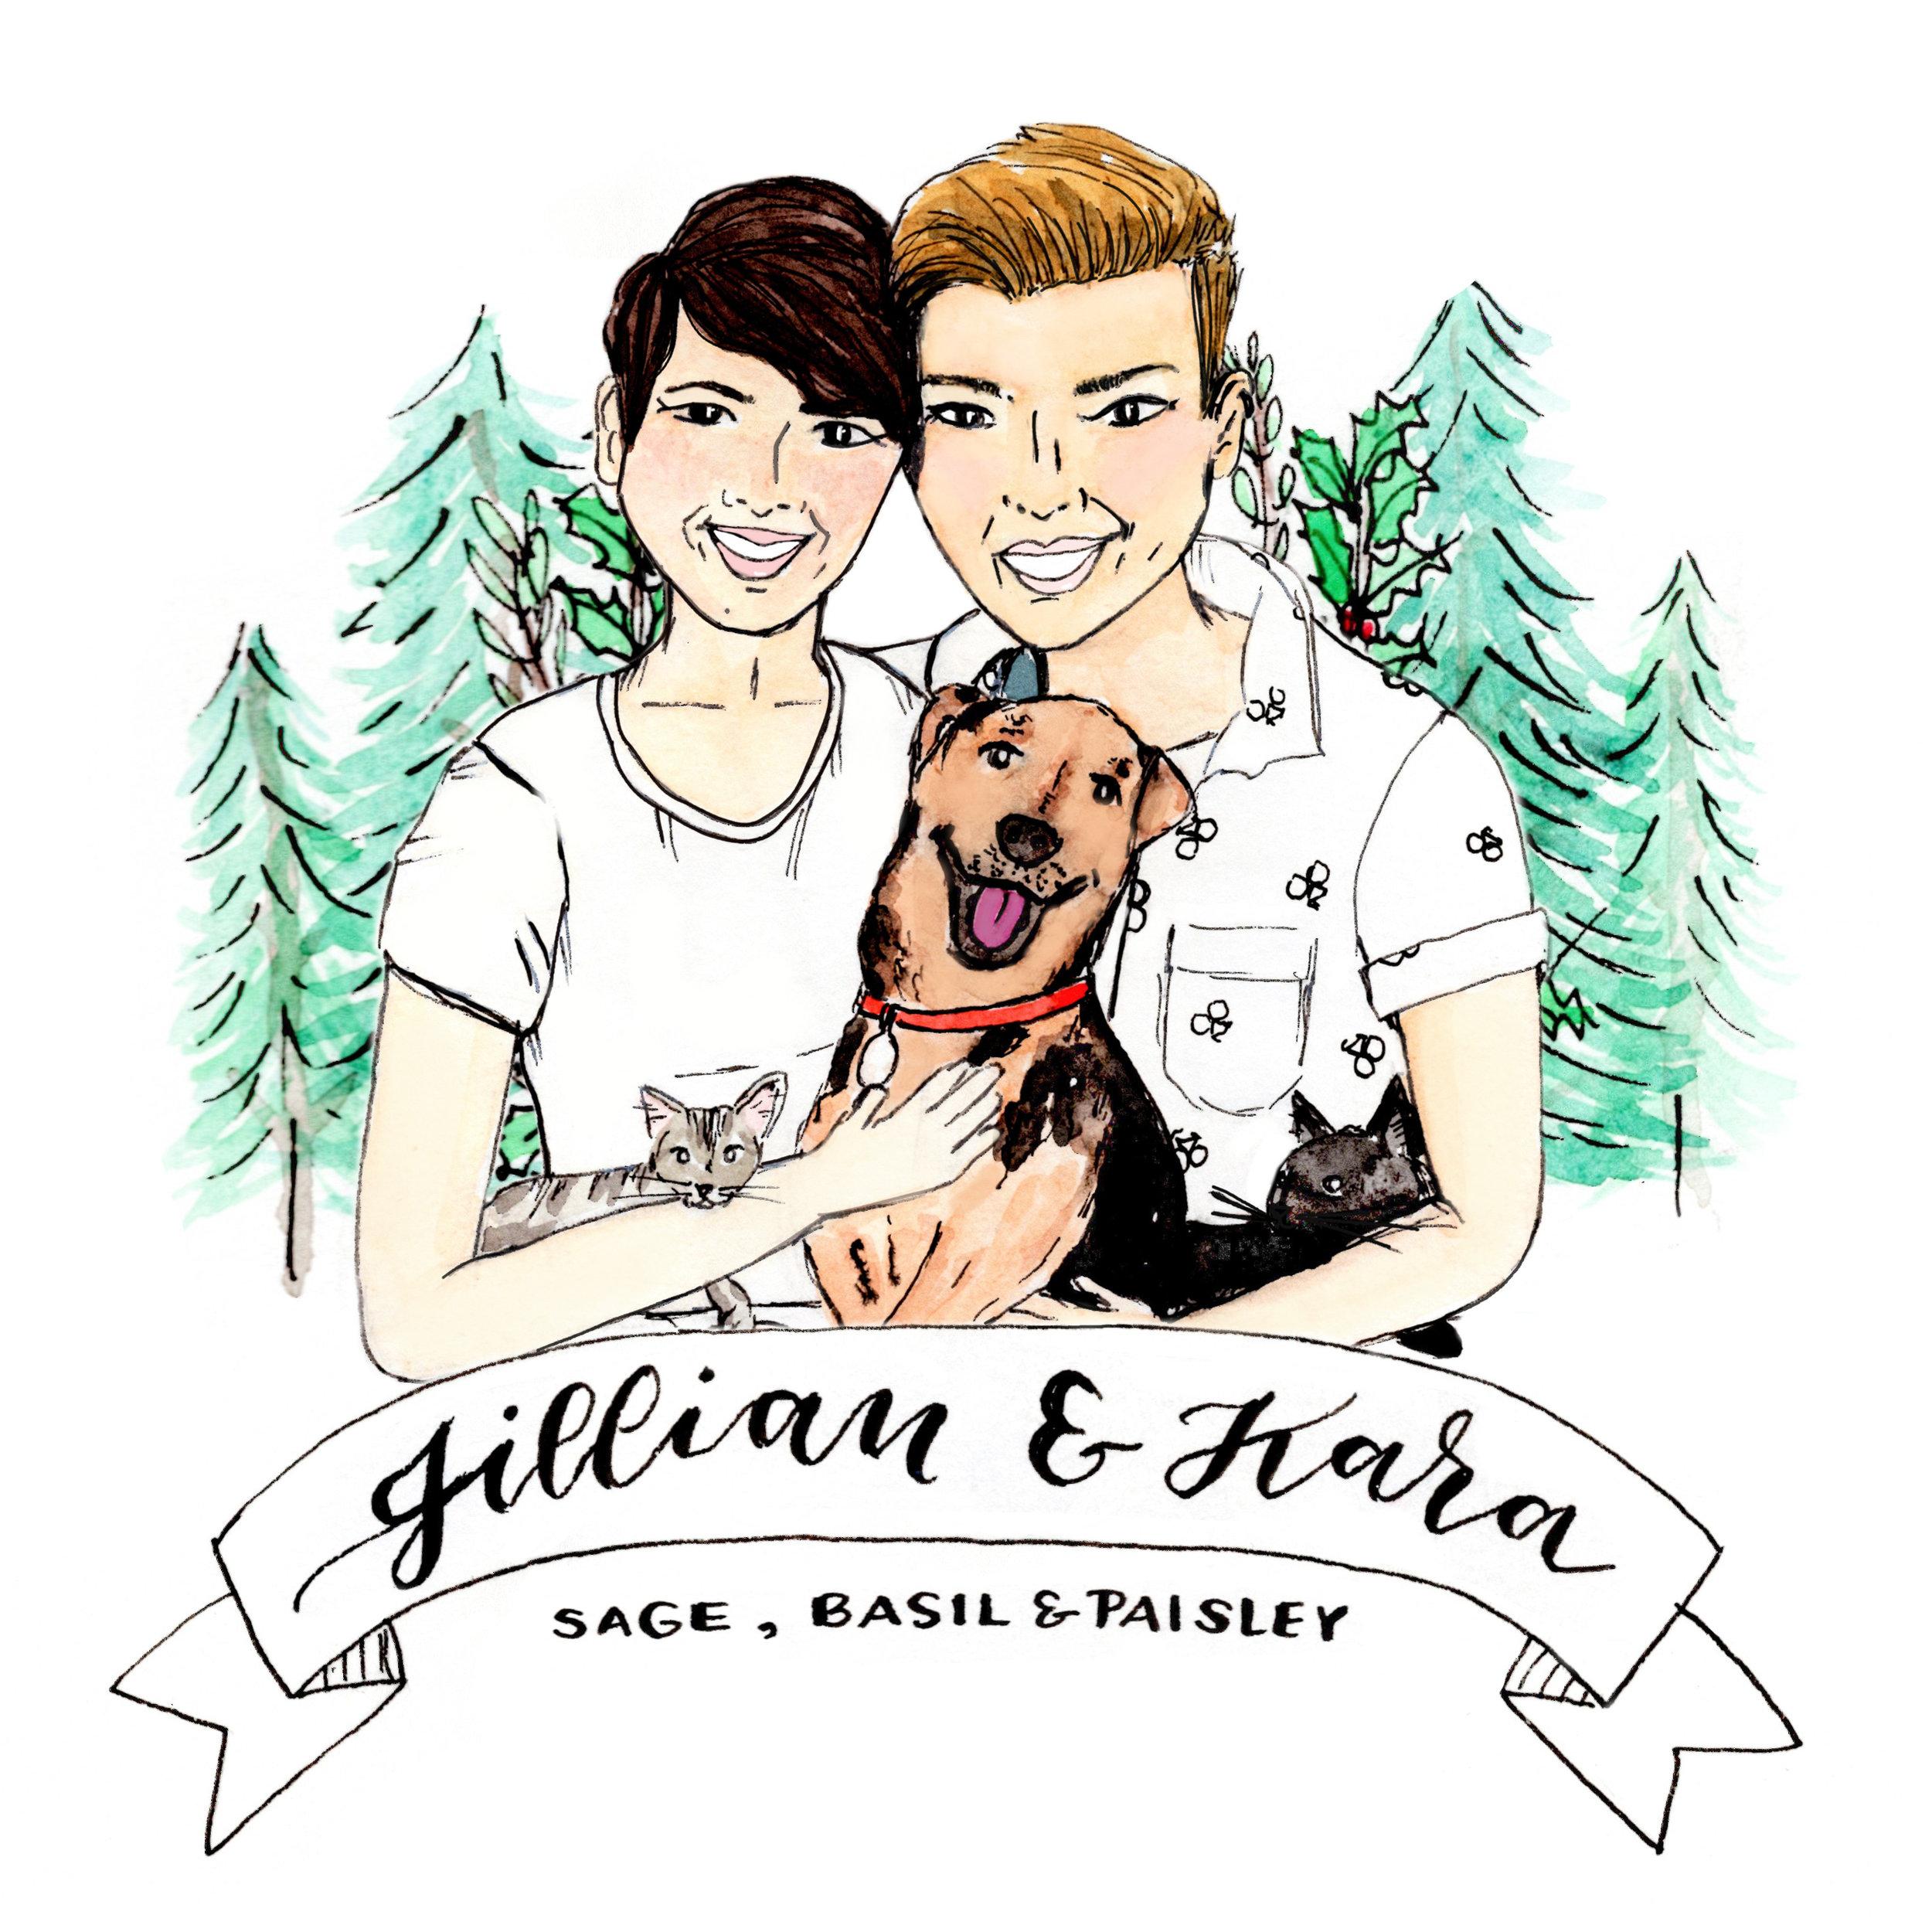 jillian and kara-square.jpg